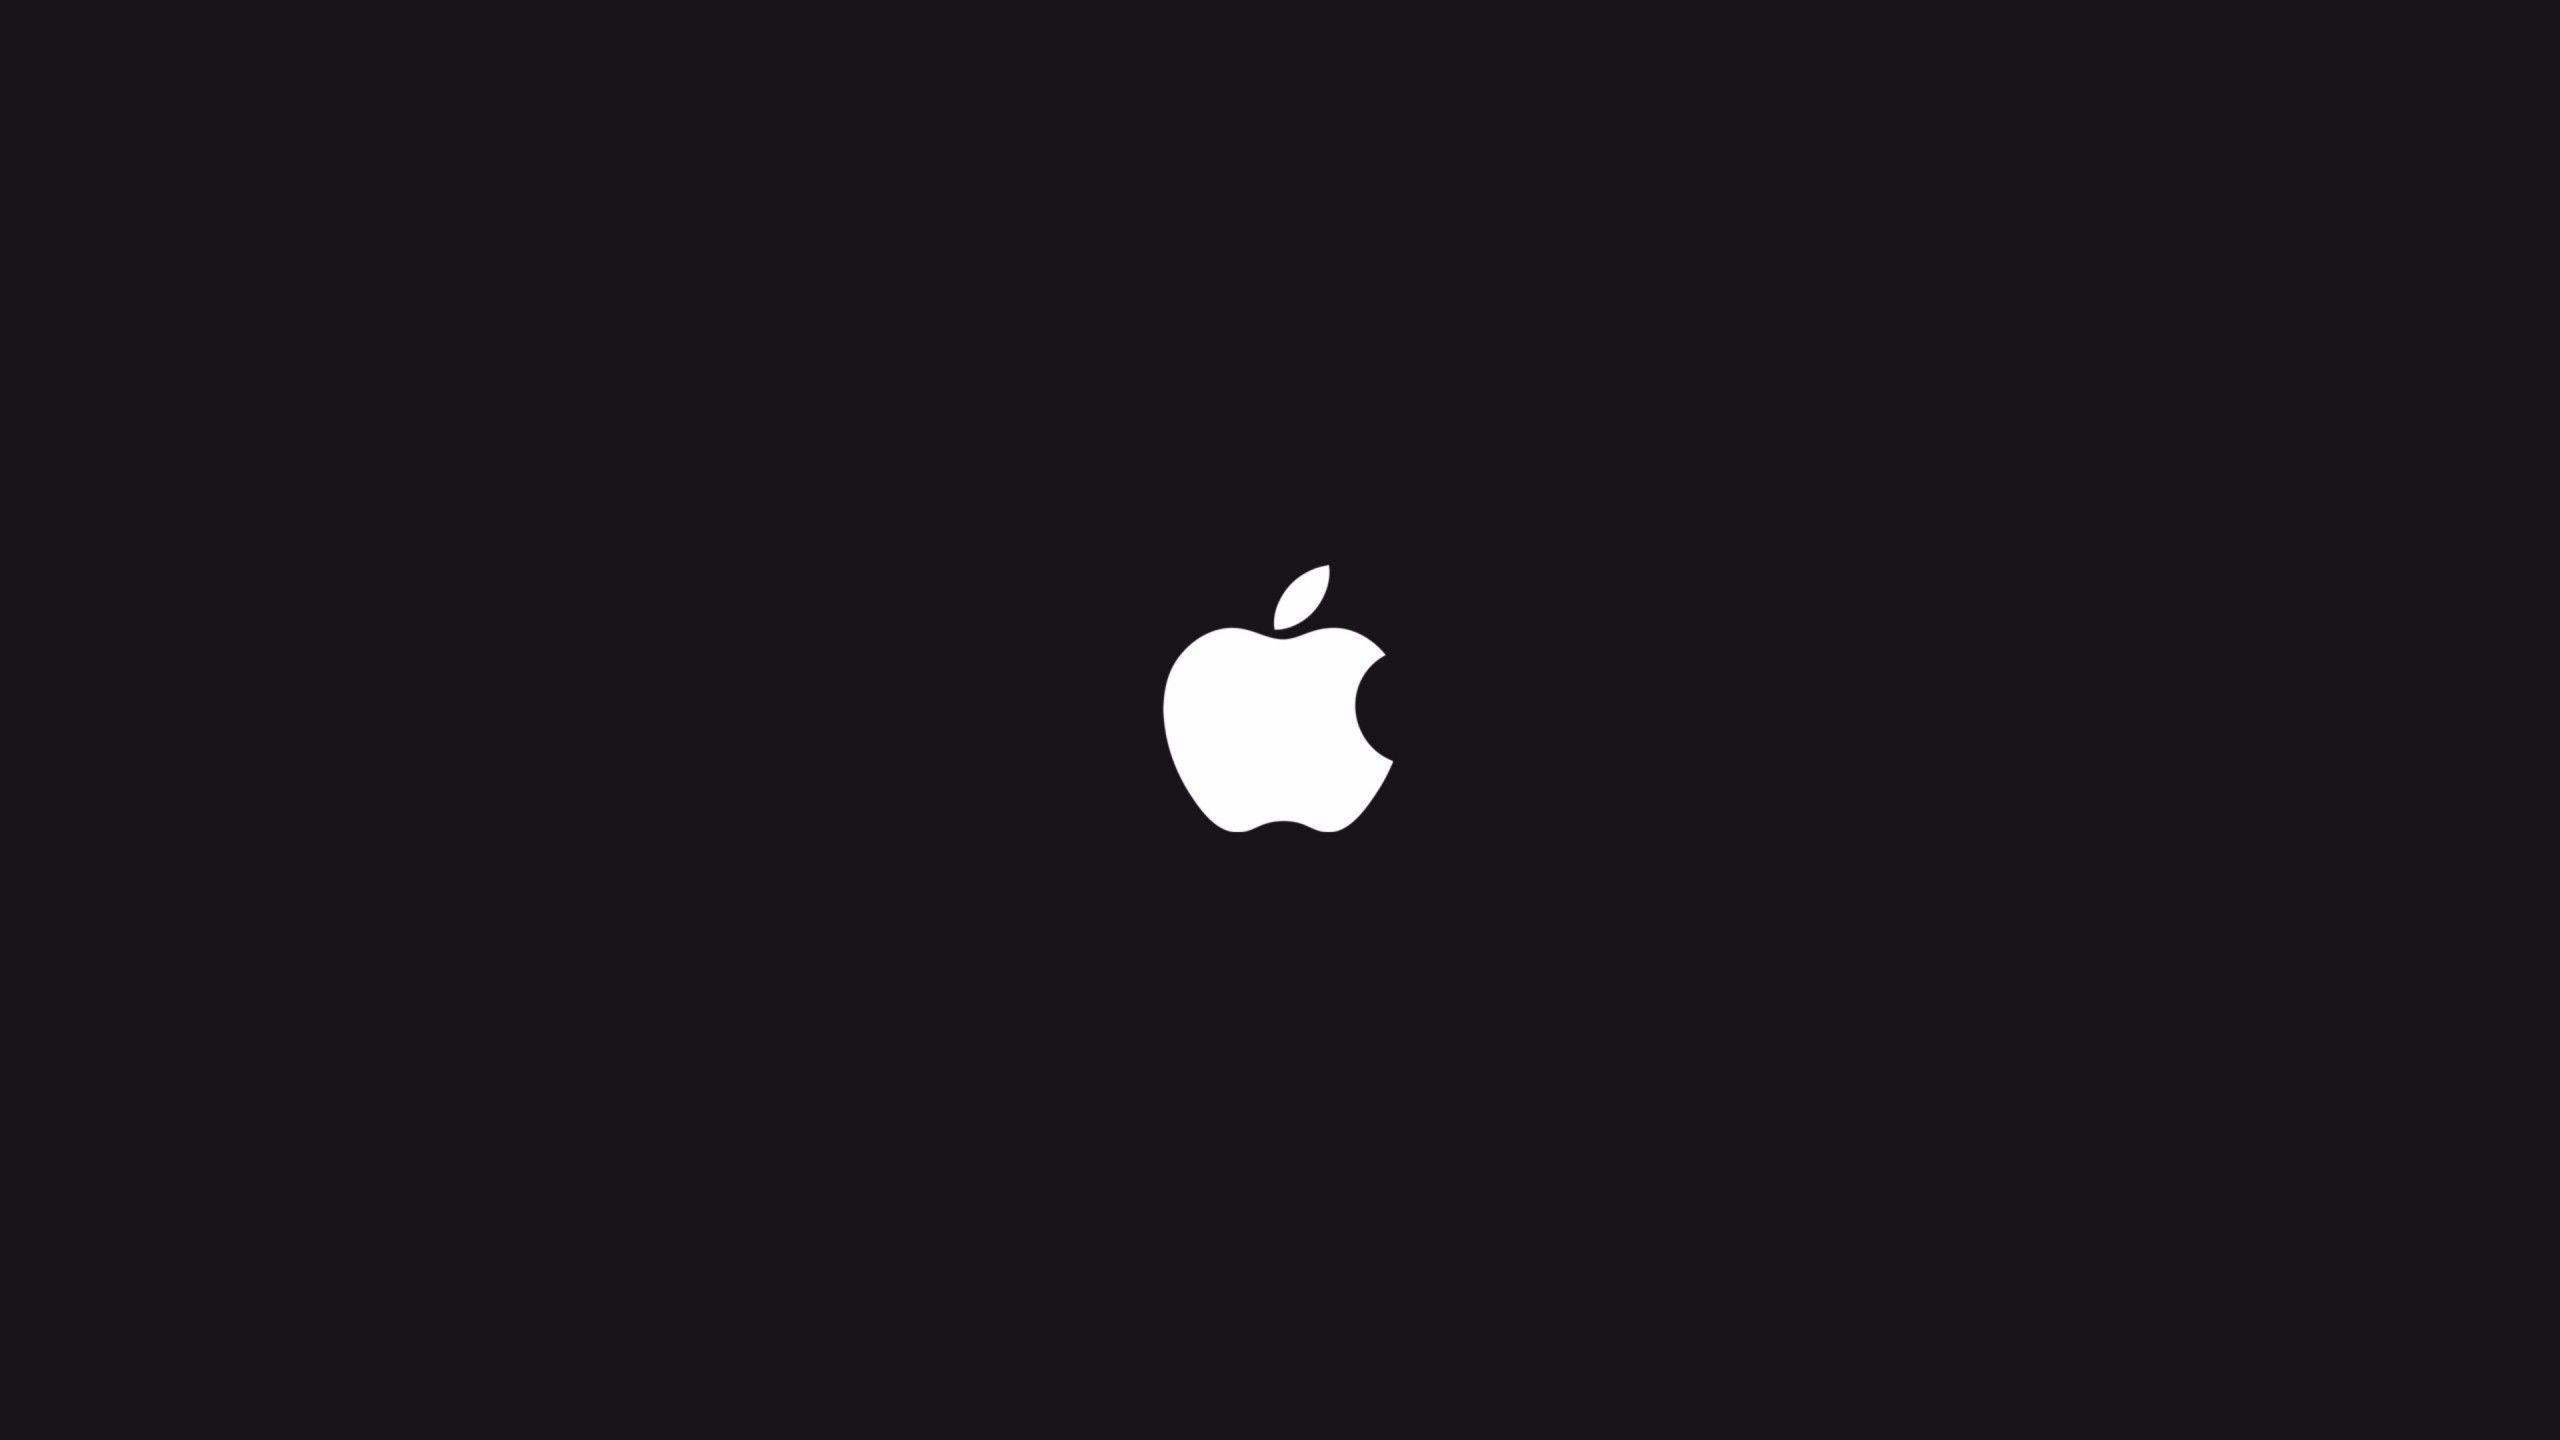 Apple Black Wallpapers - Wallpaper Cave